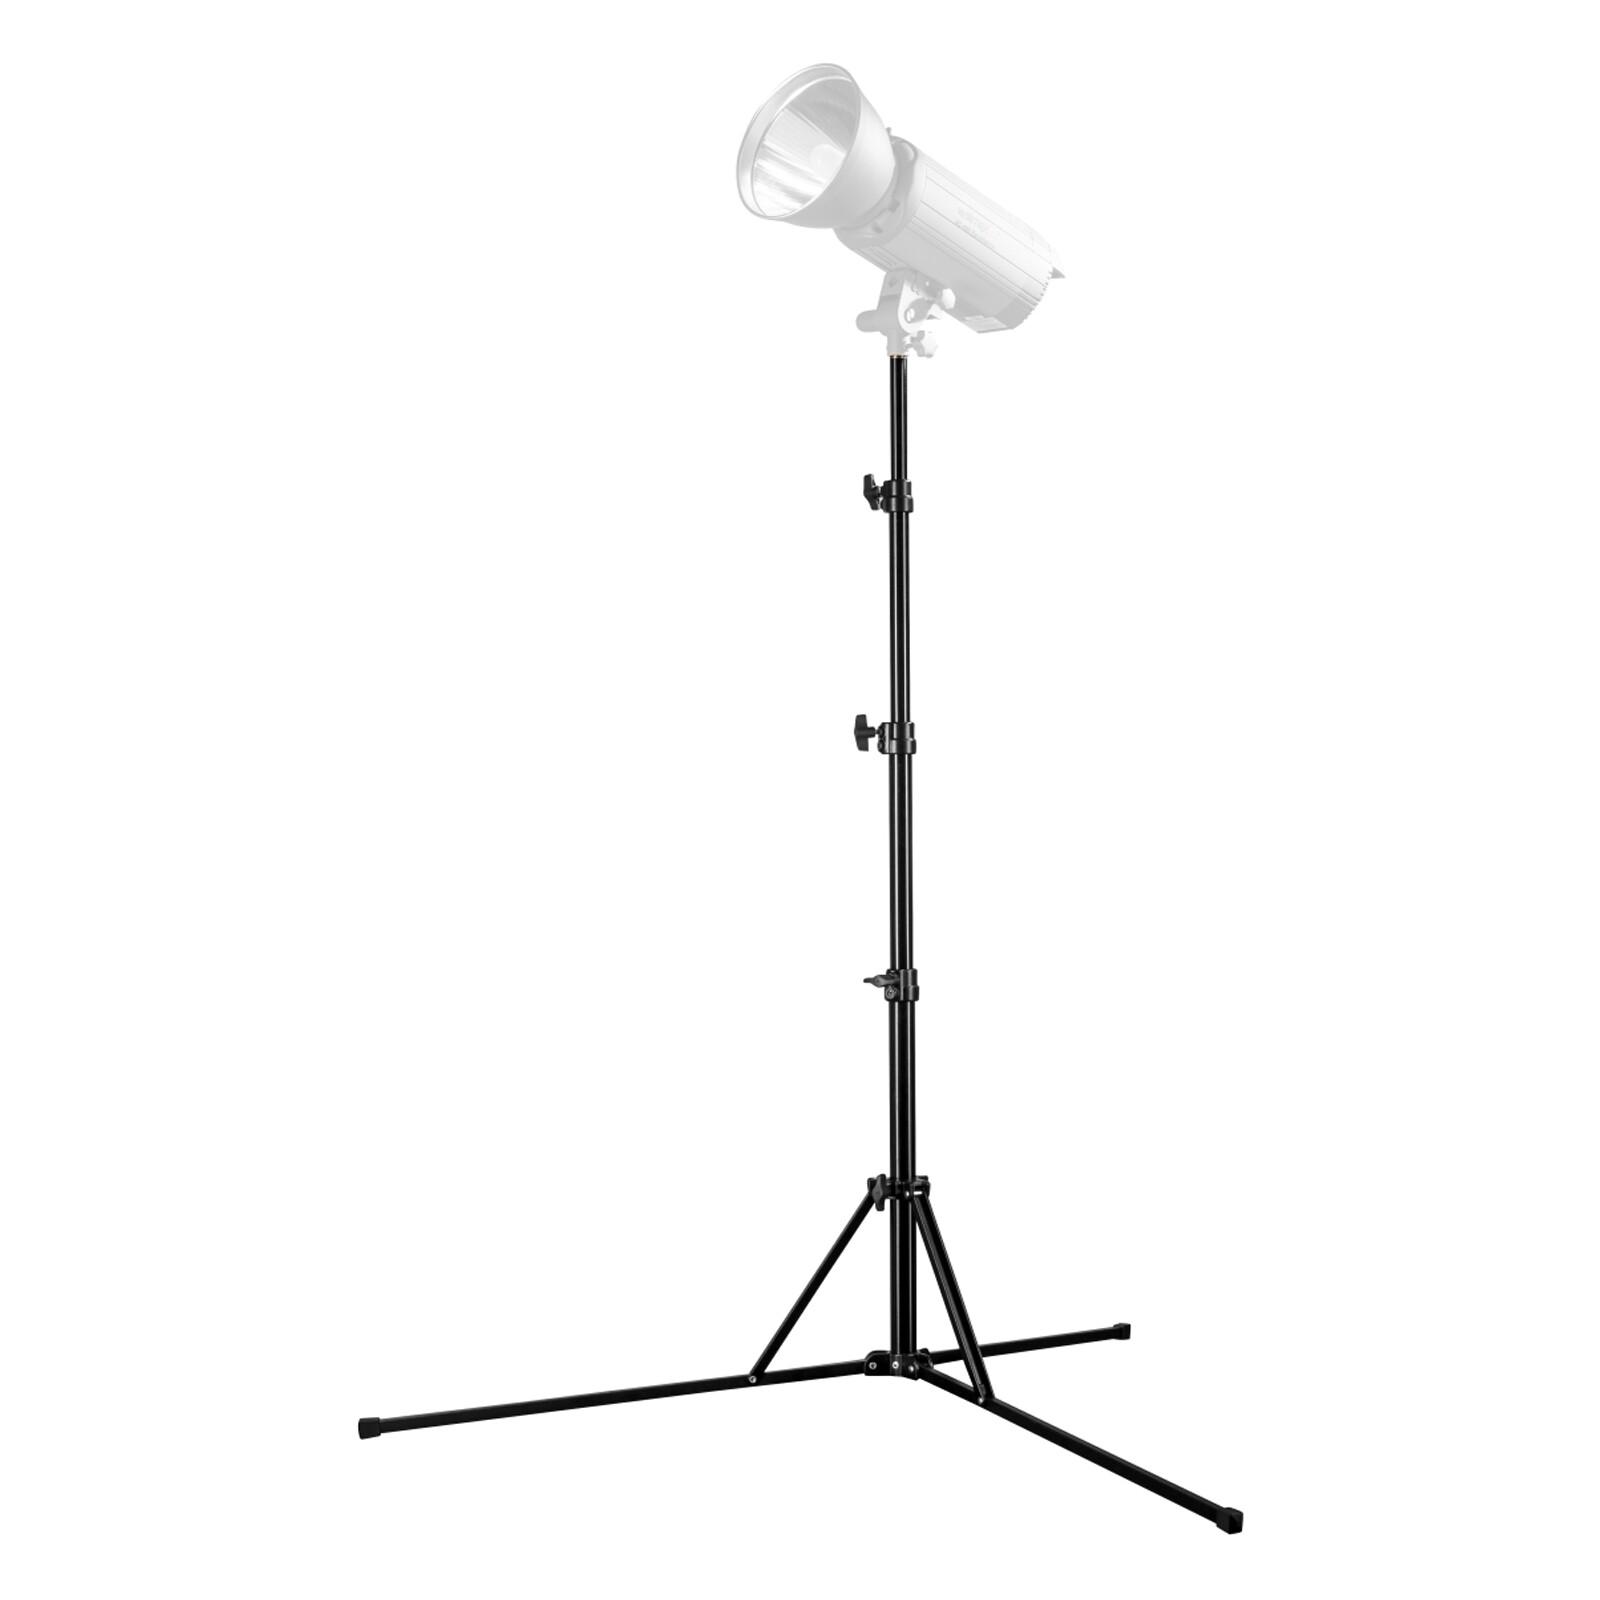 walimex pro GN-806 Lampenstativ 215cm